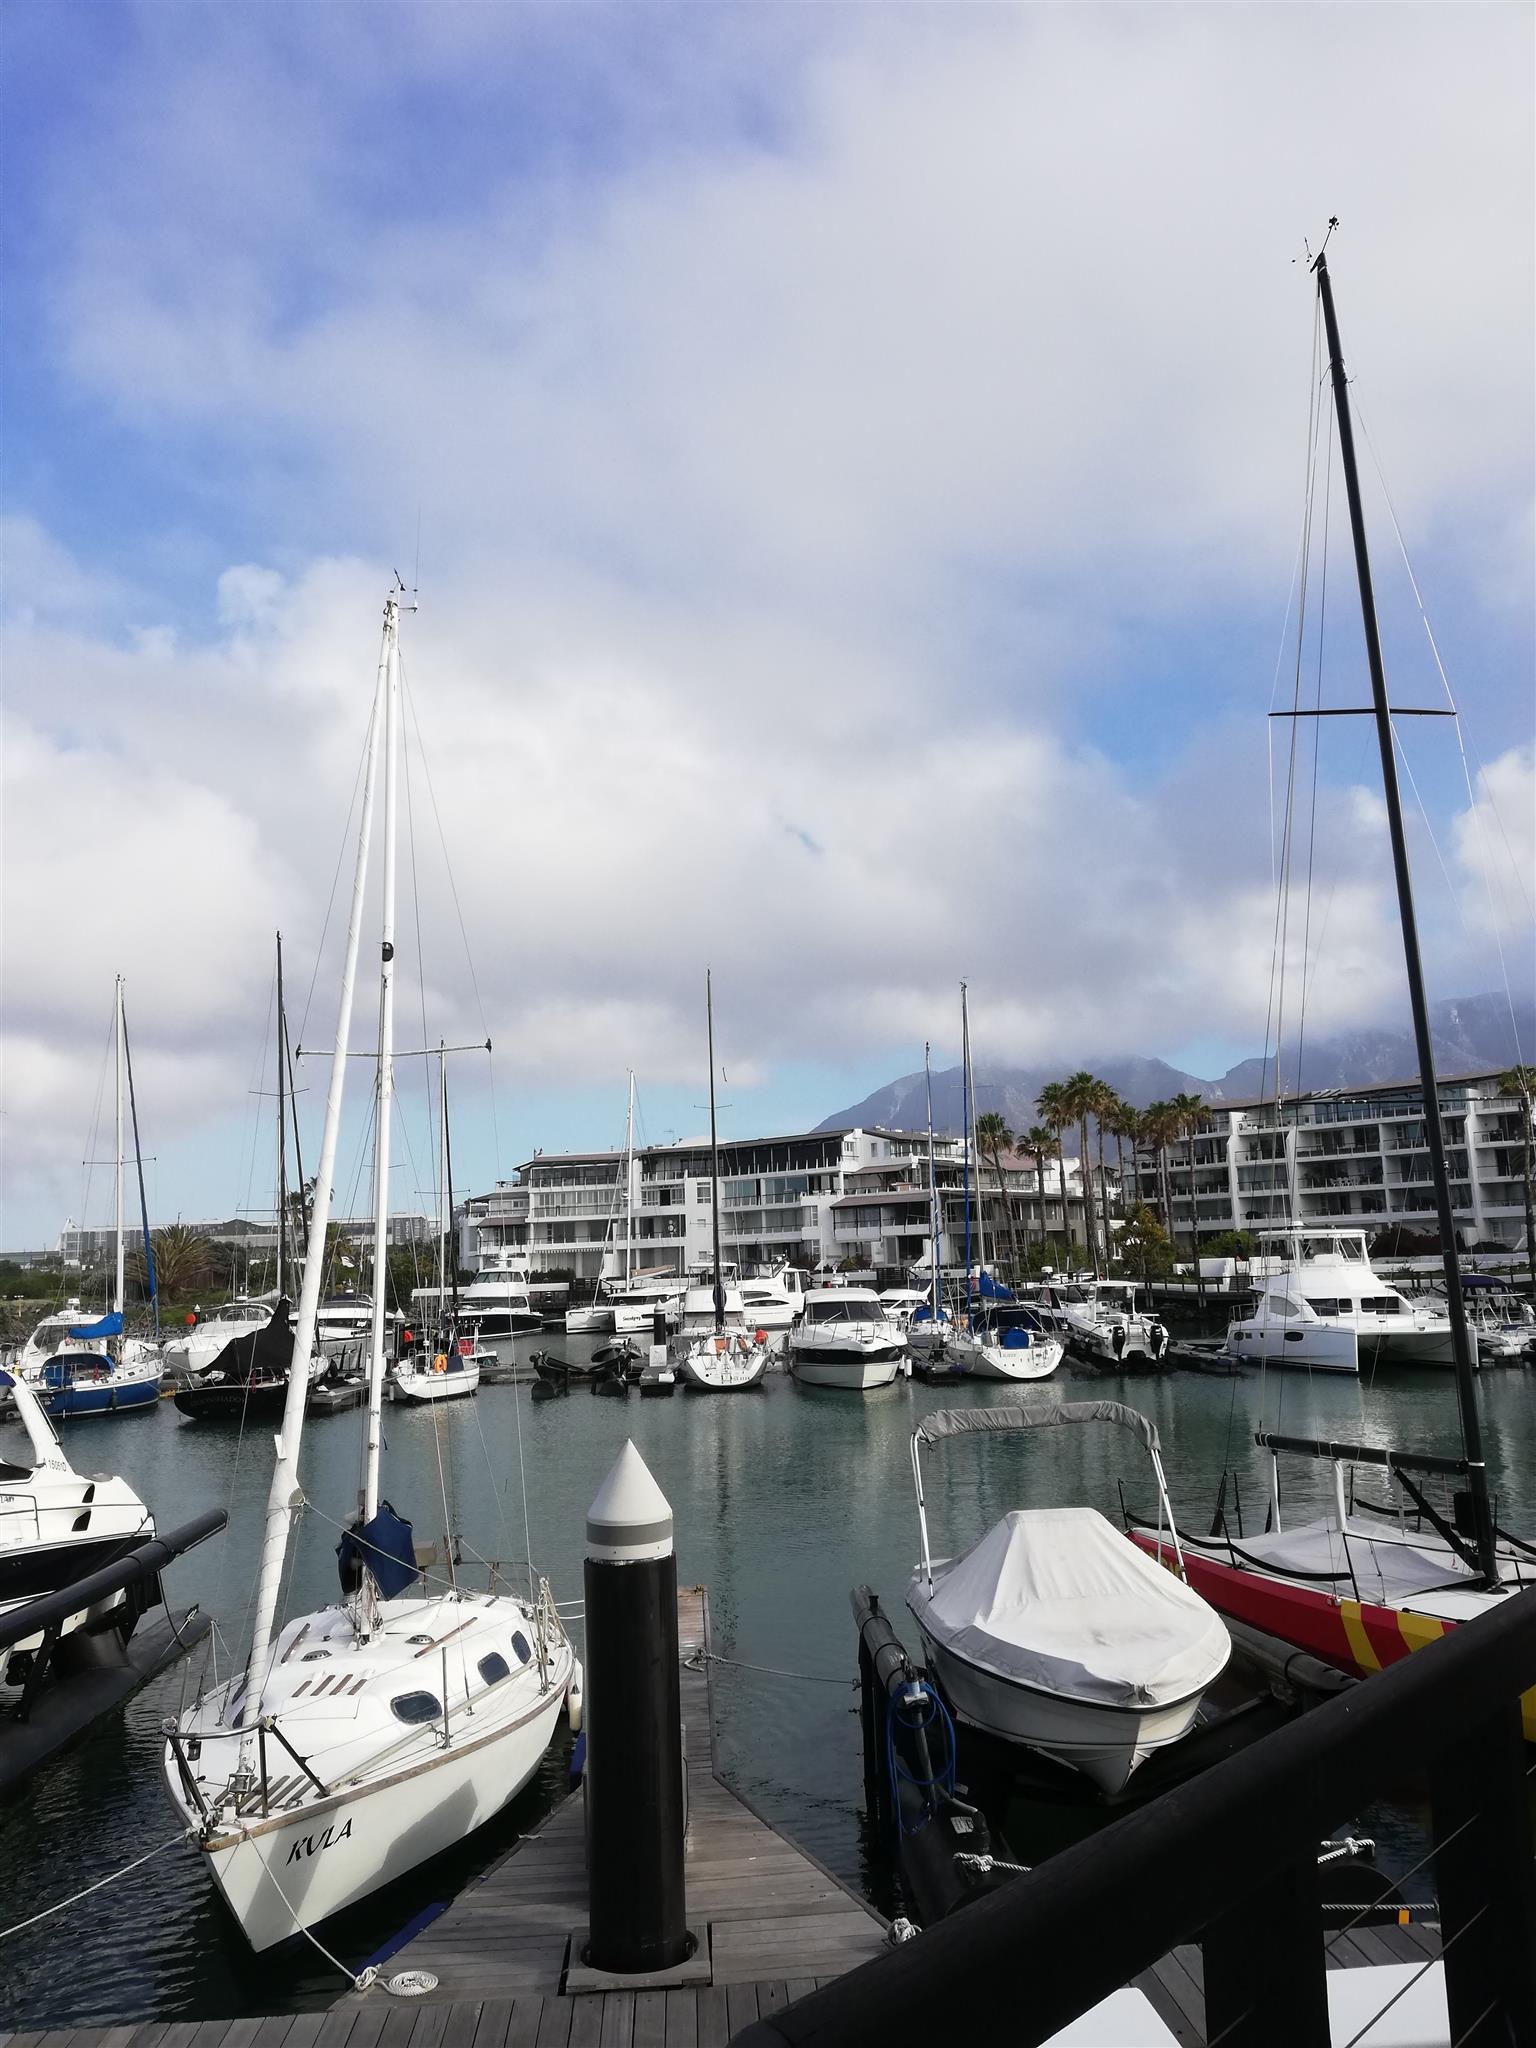 26 ft Theta sailboat